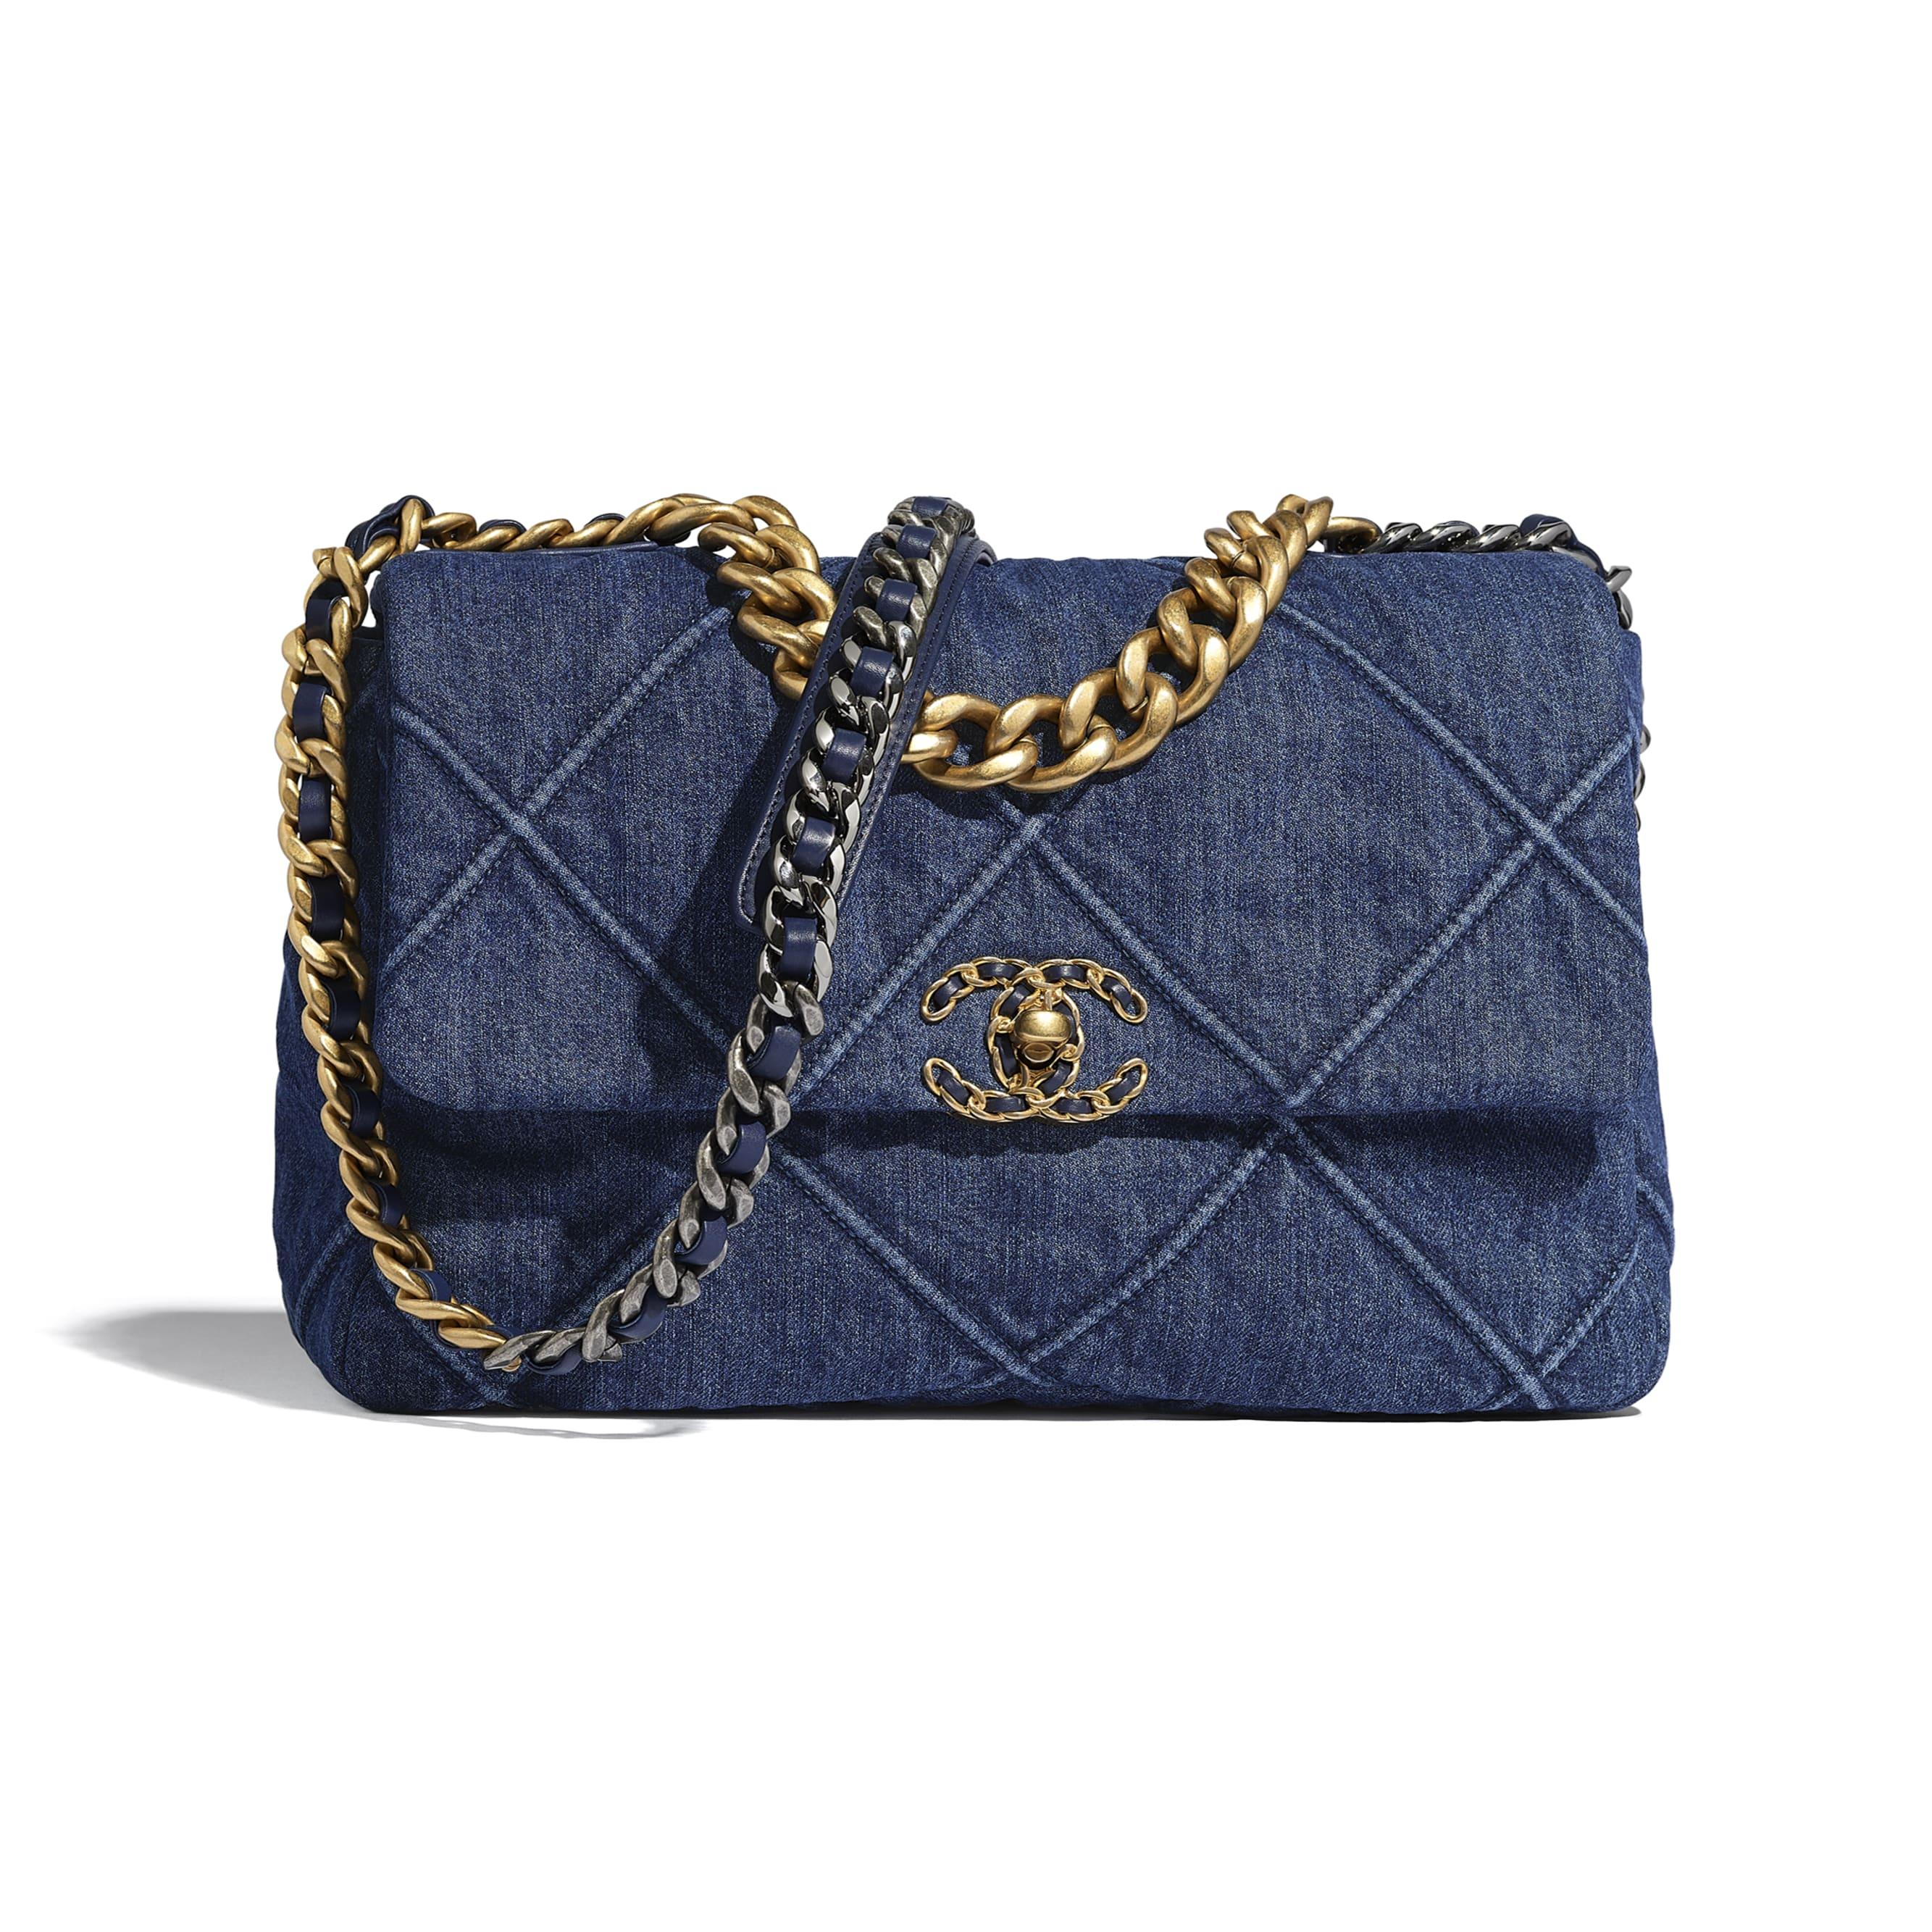 CHANEL 19 Large Flap Bag - Blue - Denim, Gold-Tone, Silver-Tone & Ruthenium-Finish Metal - CHANEL - Default view - see standard sized version